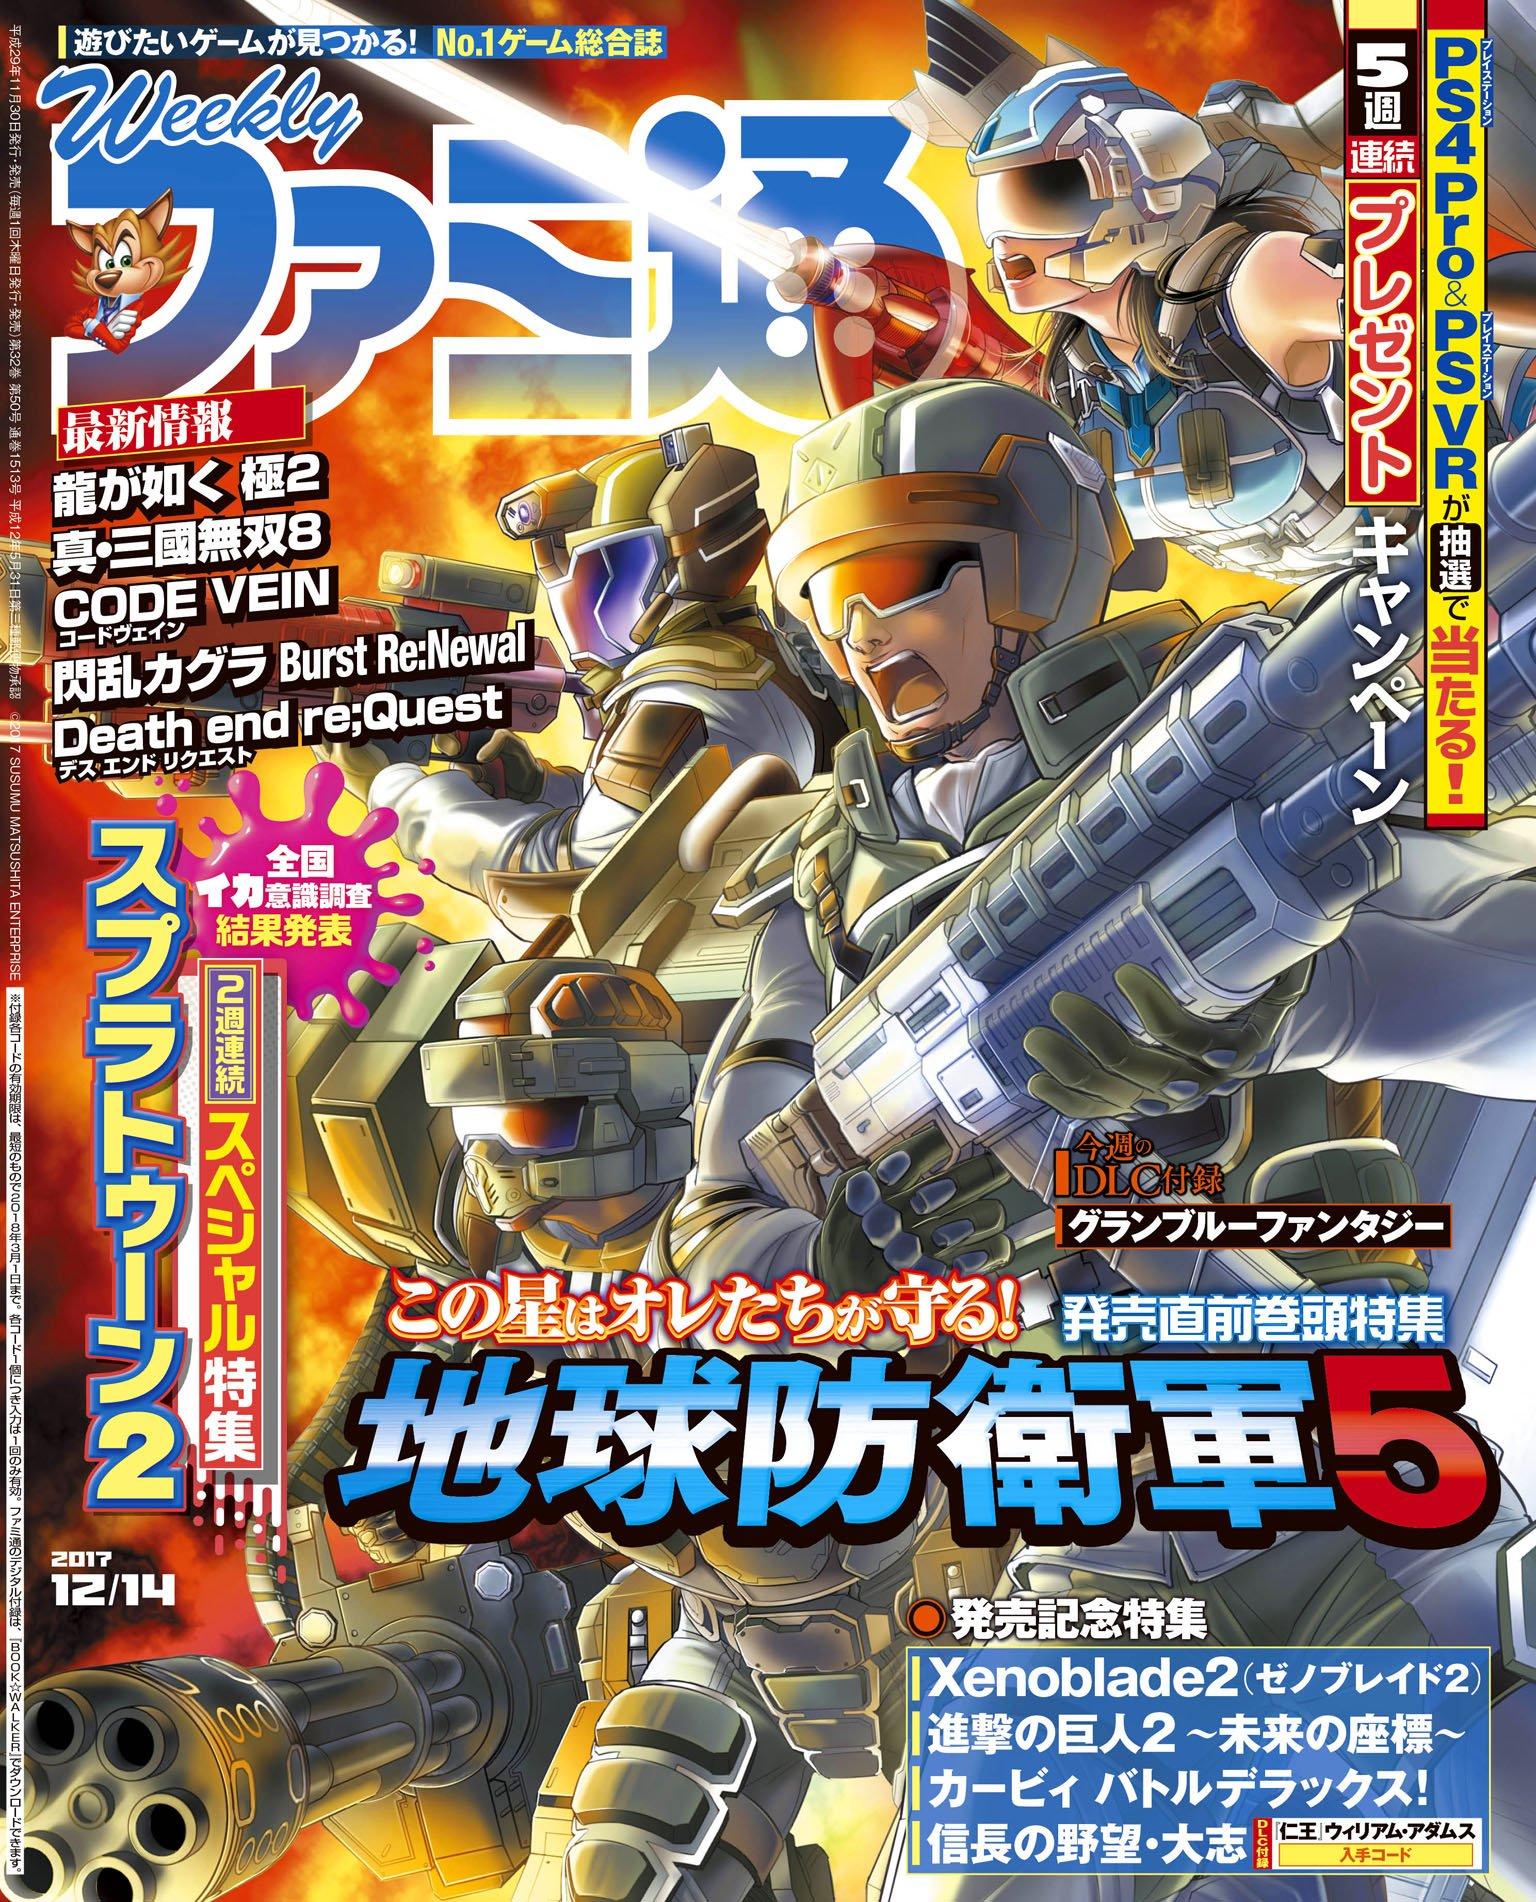 Famitsu 1513 (December 14, 2017)